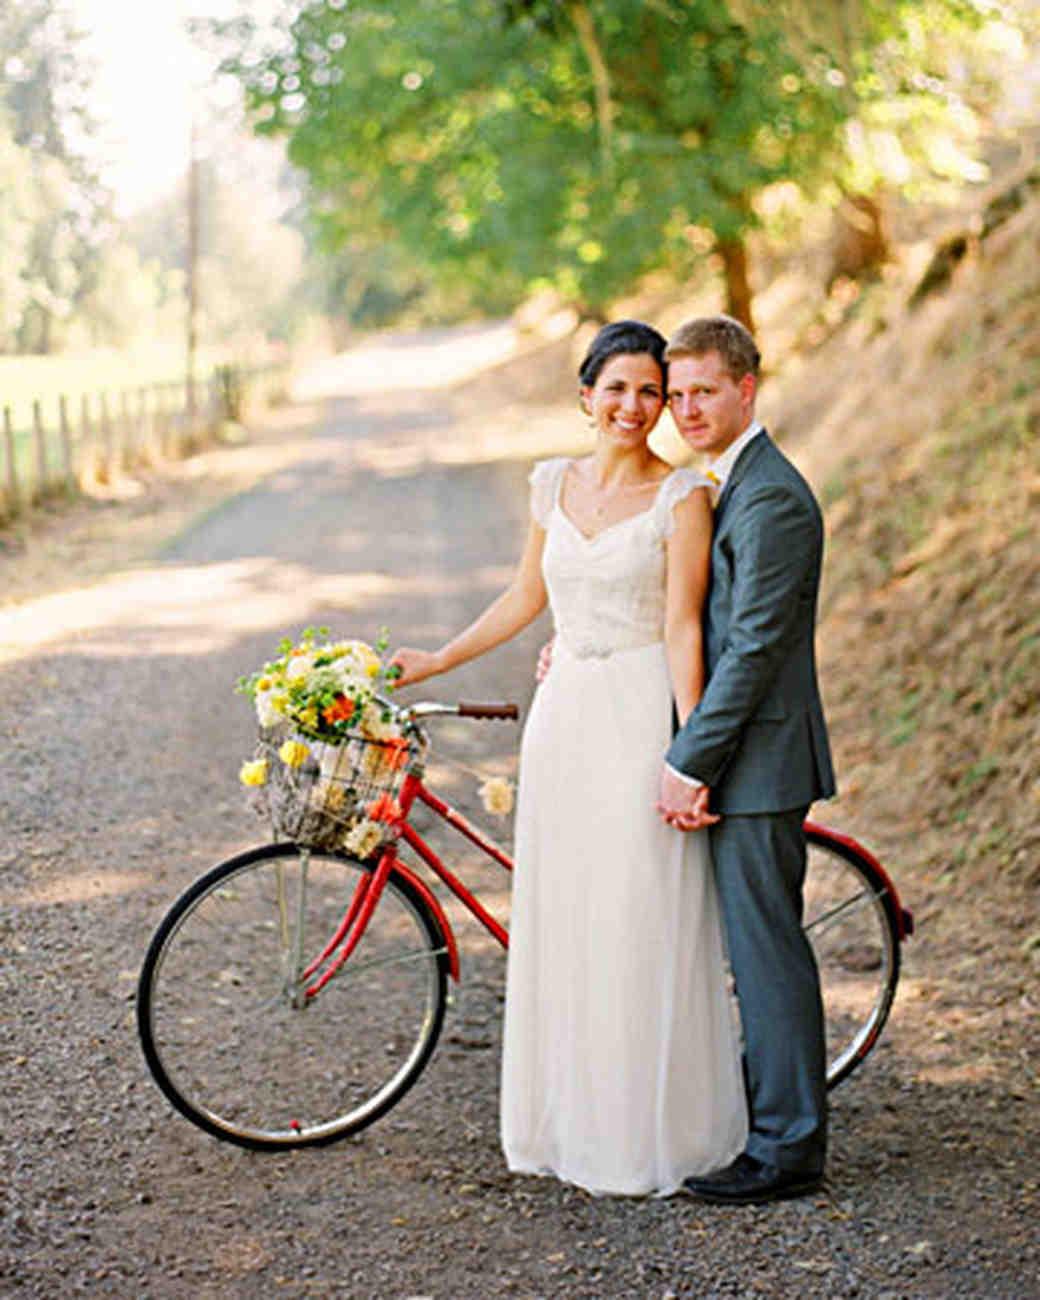 rw_1110_alivia_scott_bike.jpg